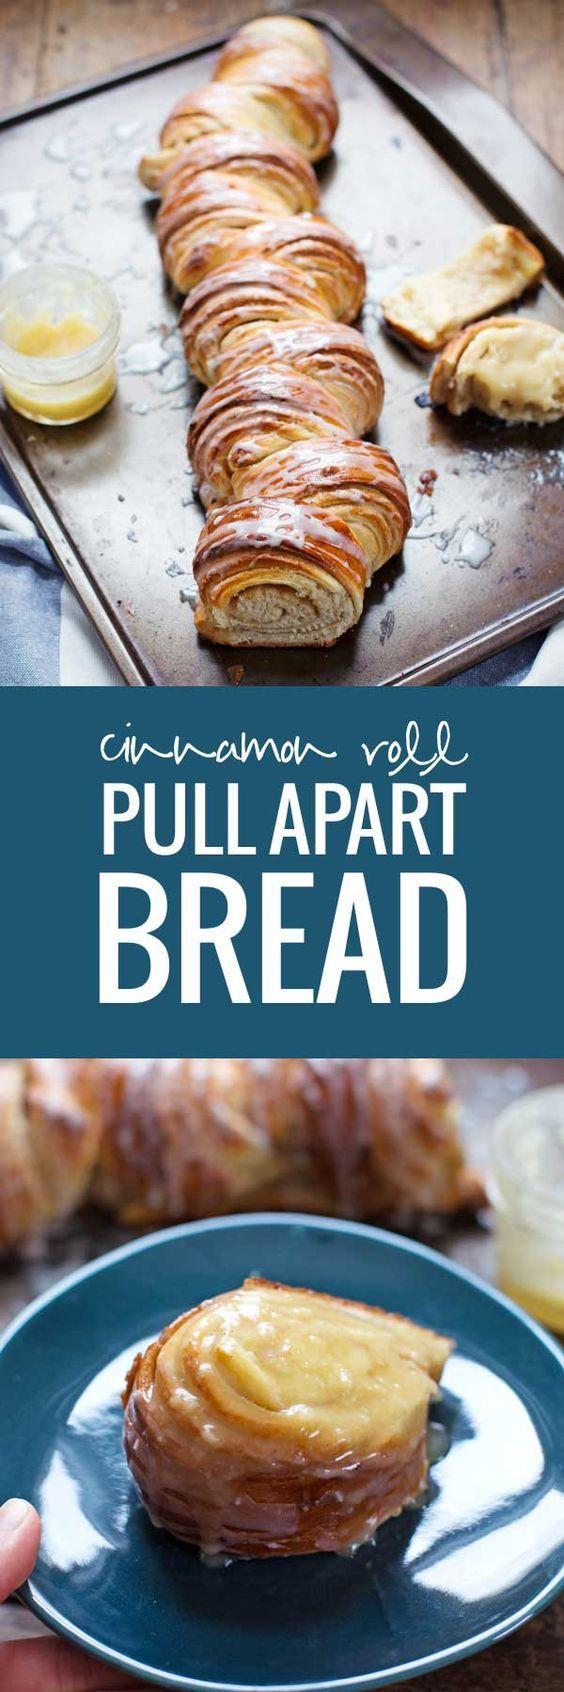 Homemade Cinnamon Roll Pull Apart Bread - so pretty and totally irresistible. | pinchofyum.com